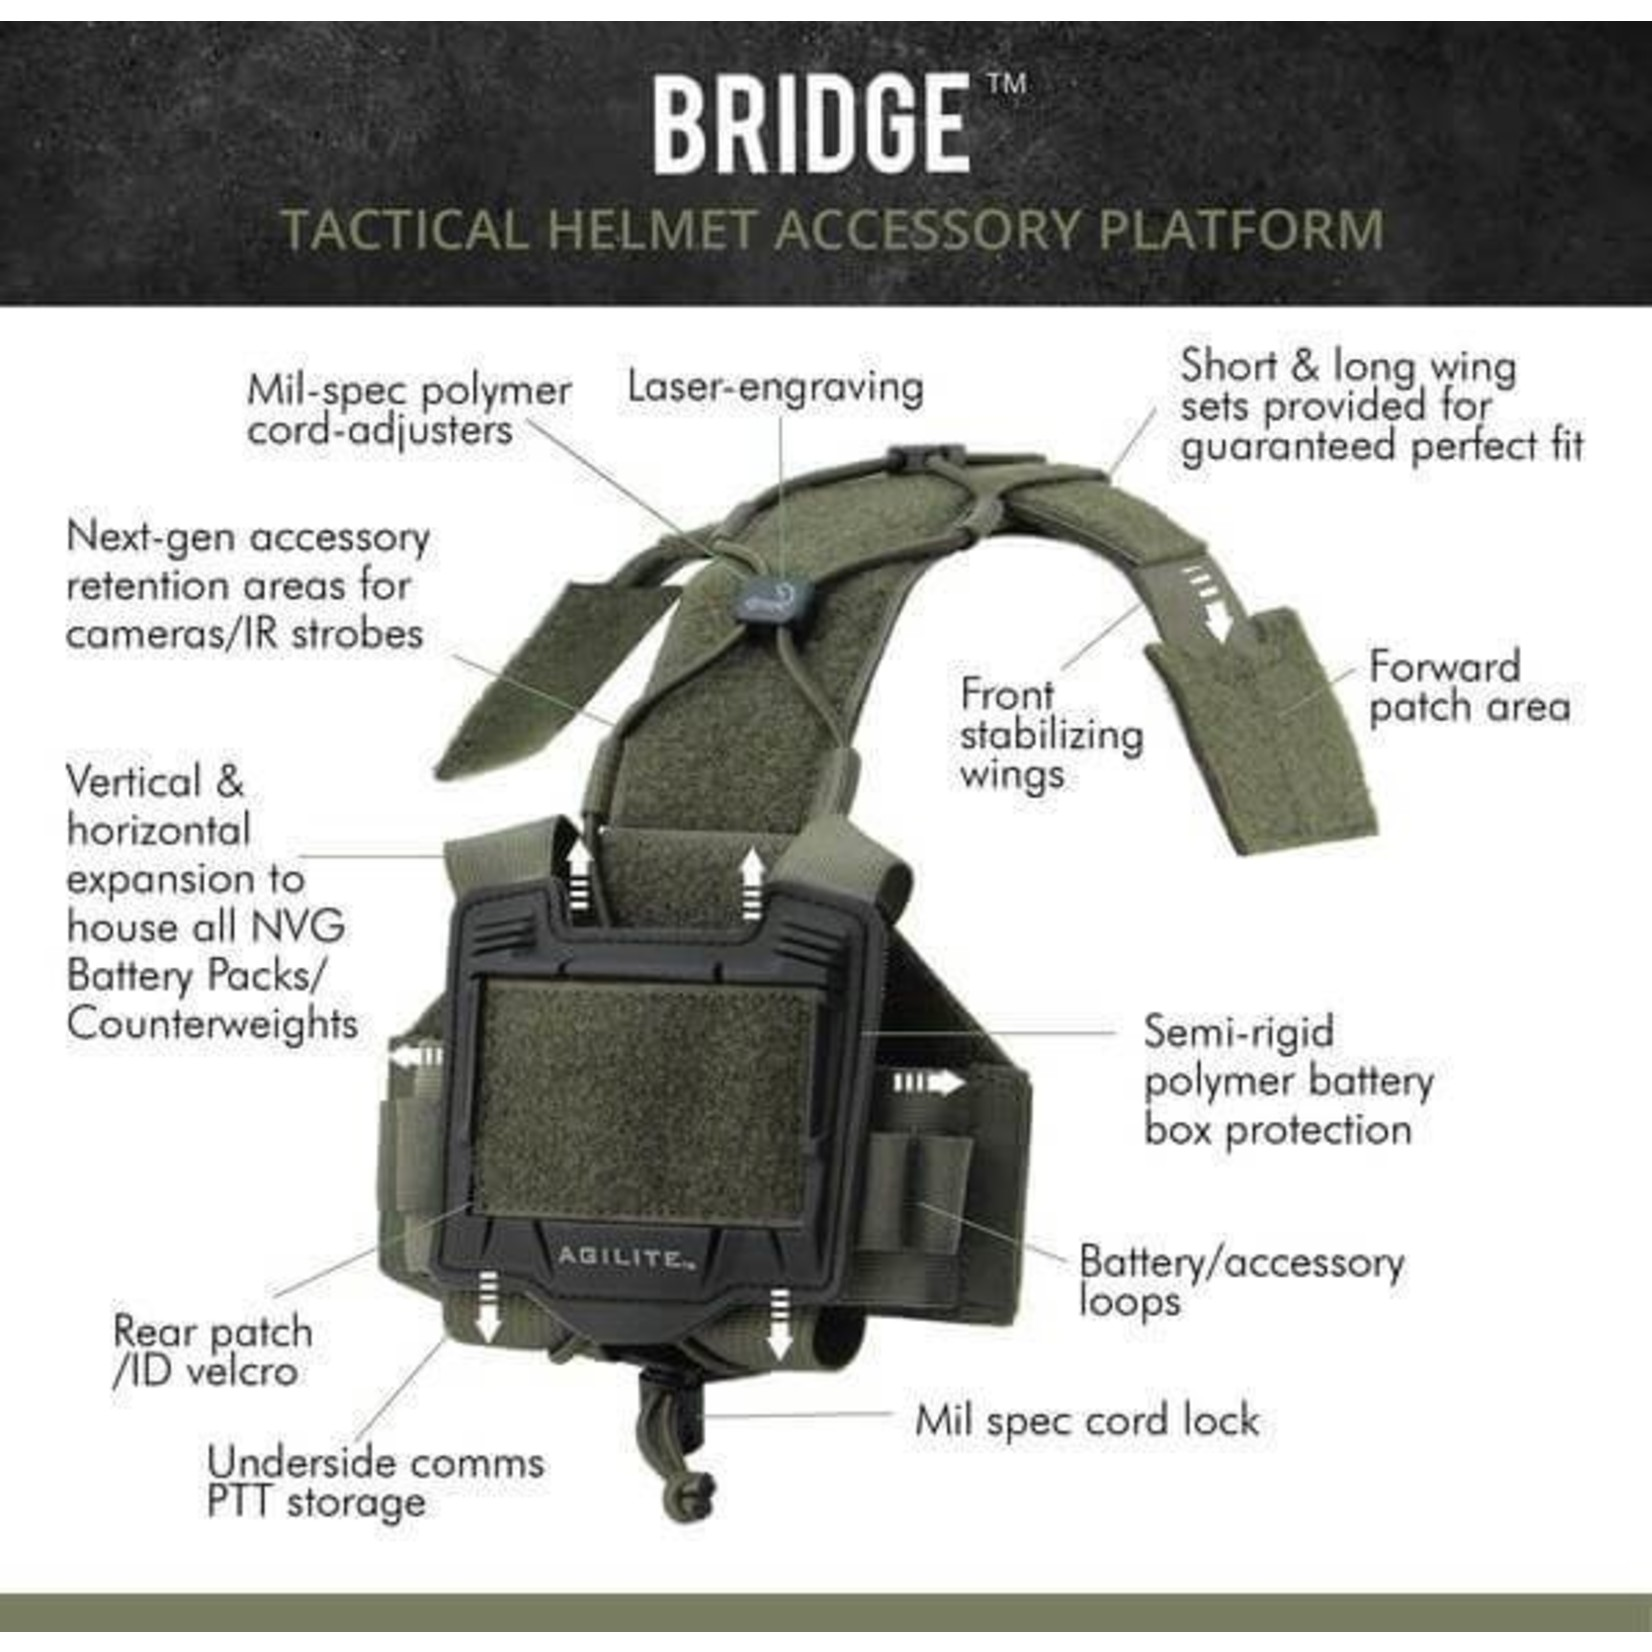 AGILITE HELMET BRIDGE-TACTICAL HELMET ACCESSORY PLATFORM